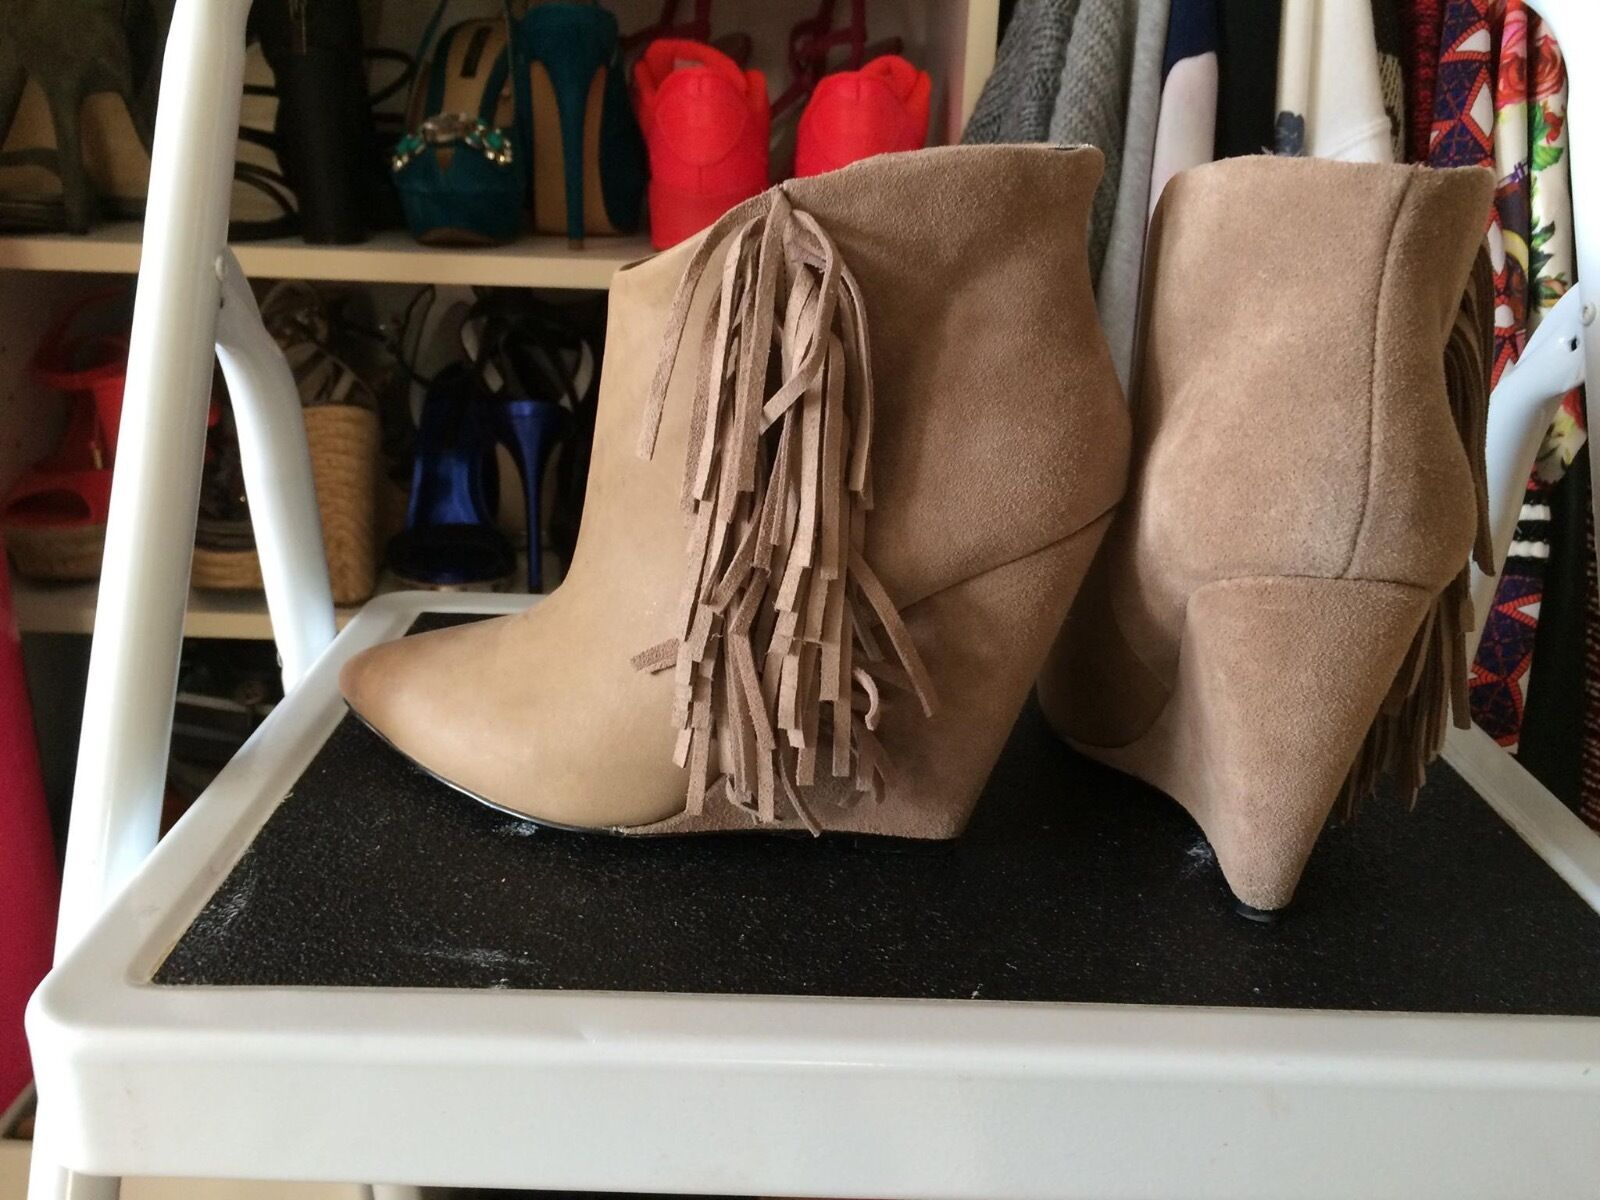 Betsey Johnson Beige/Taupe Ziah Fringe Boho Ankle Boots Size 7 *WORN ONCE*